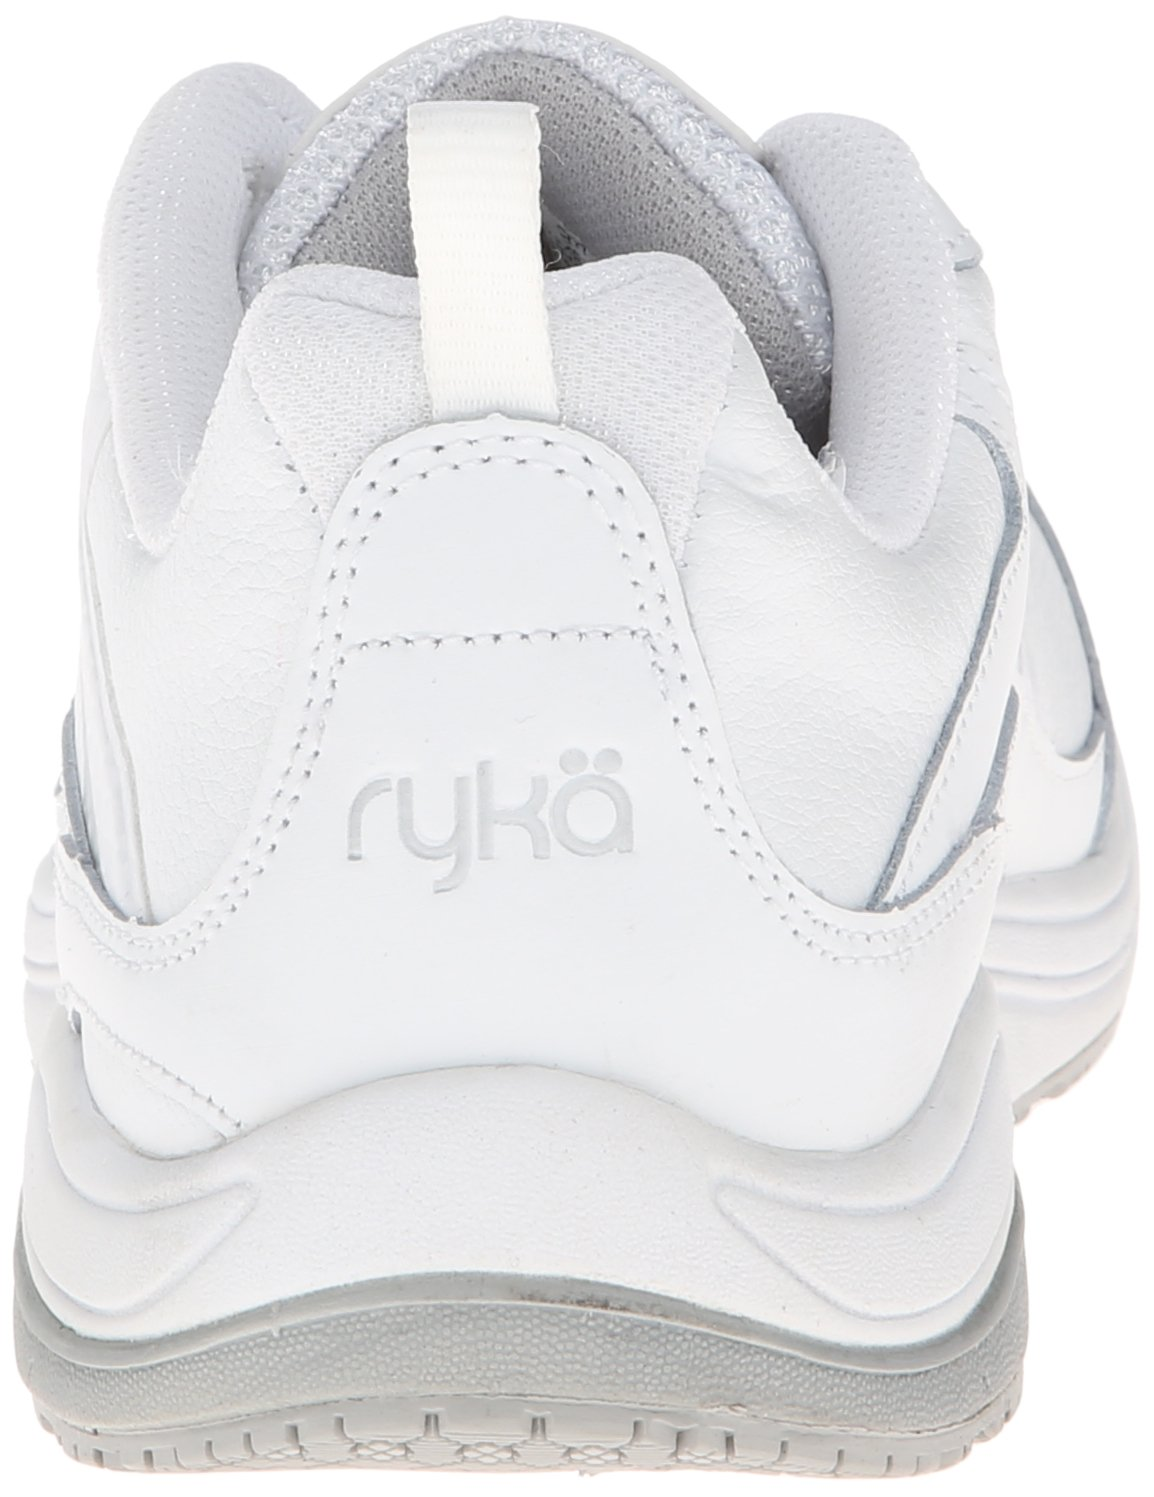 Ryka Women's Intent XT 2 SR Trail Running US|White/Chrome Shoe B00IUO7XTE 8.5 B(M) US|White/Chrome Running Silver d24ae8